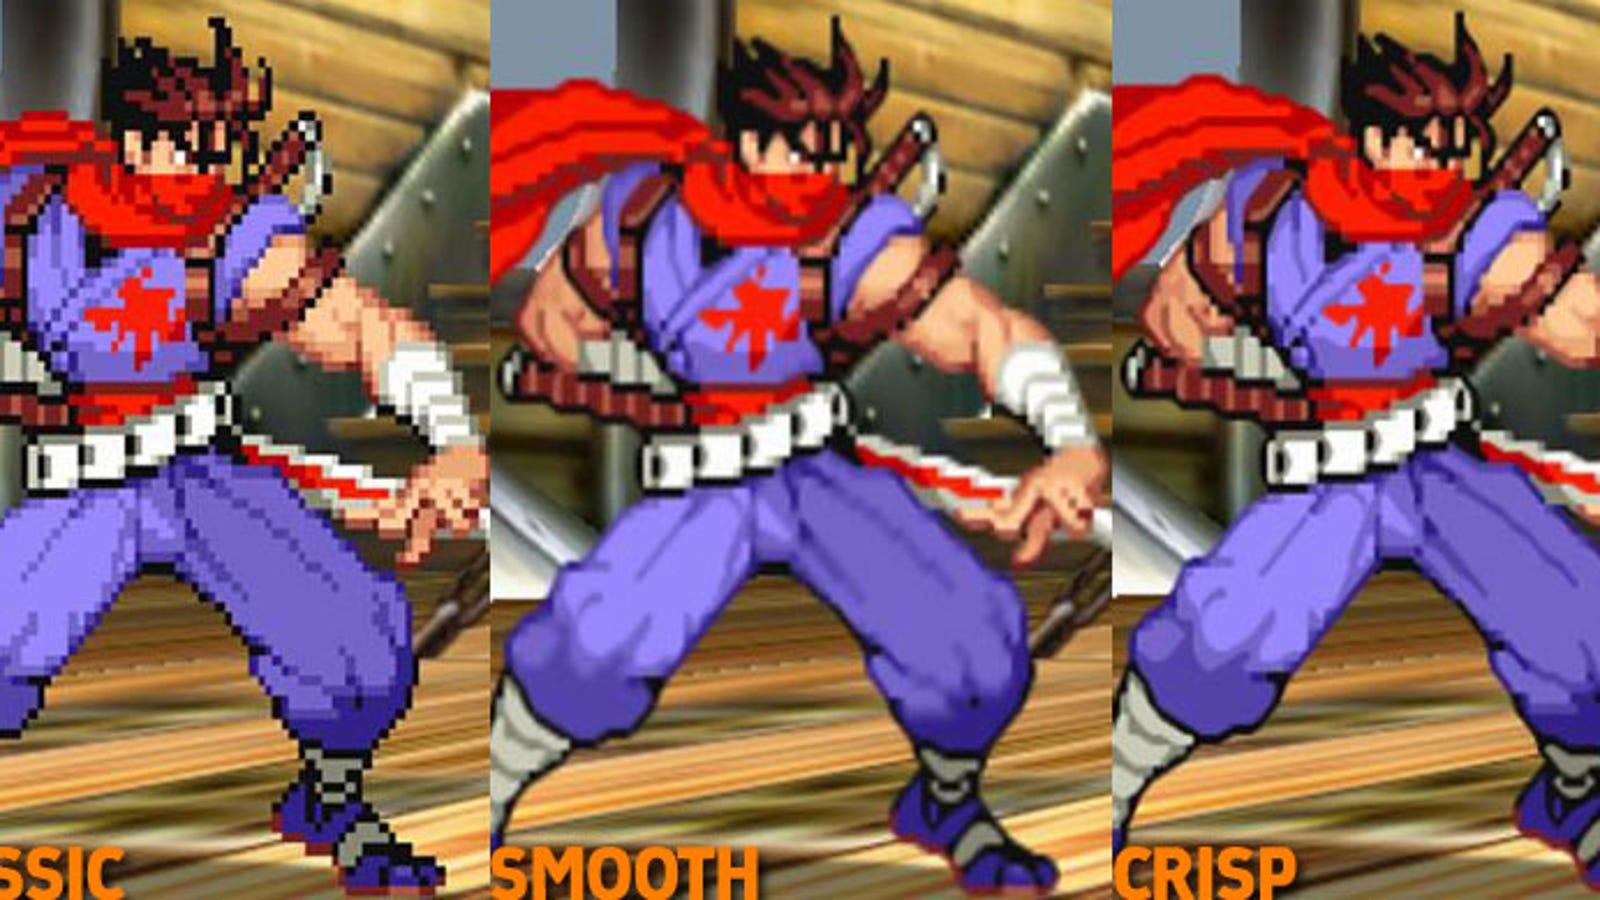 Marvel Vs Capcom 2 Old Graphics Vs New Graphics